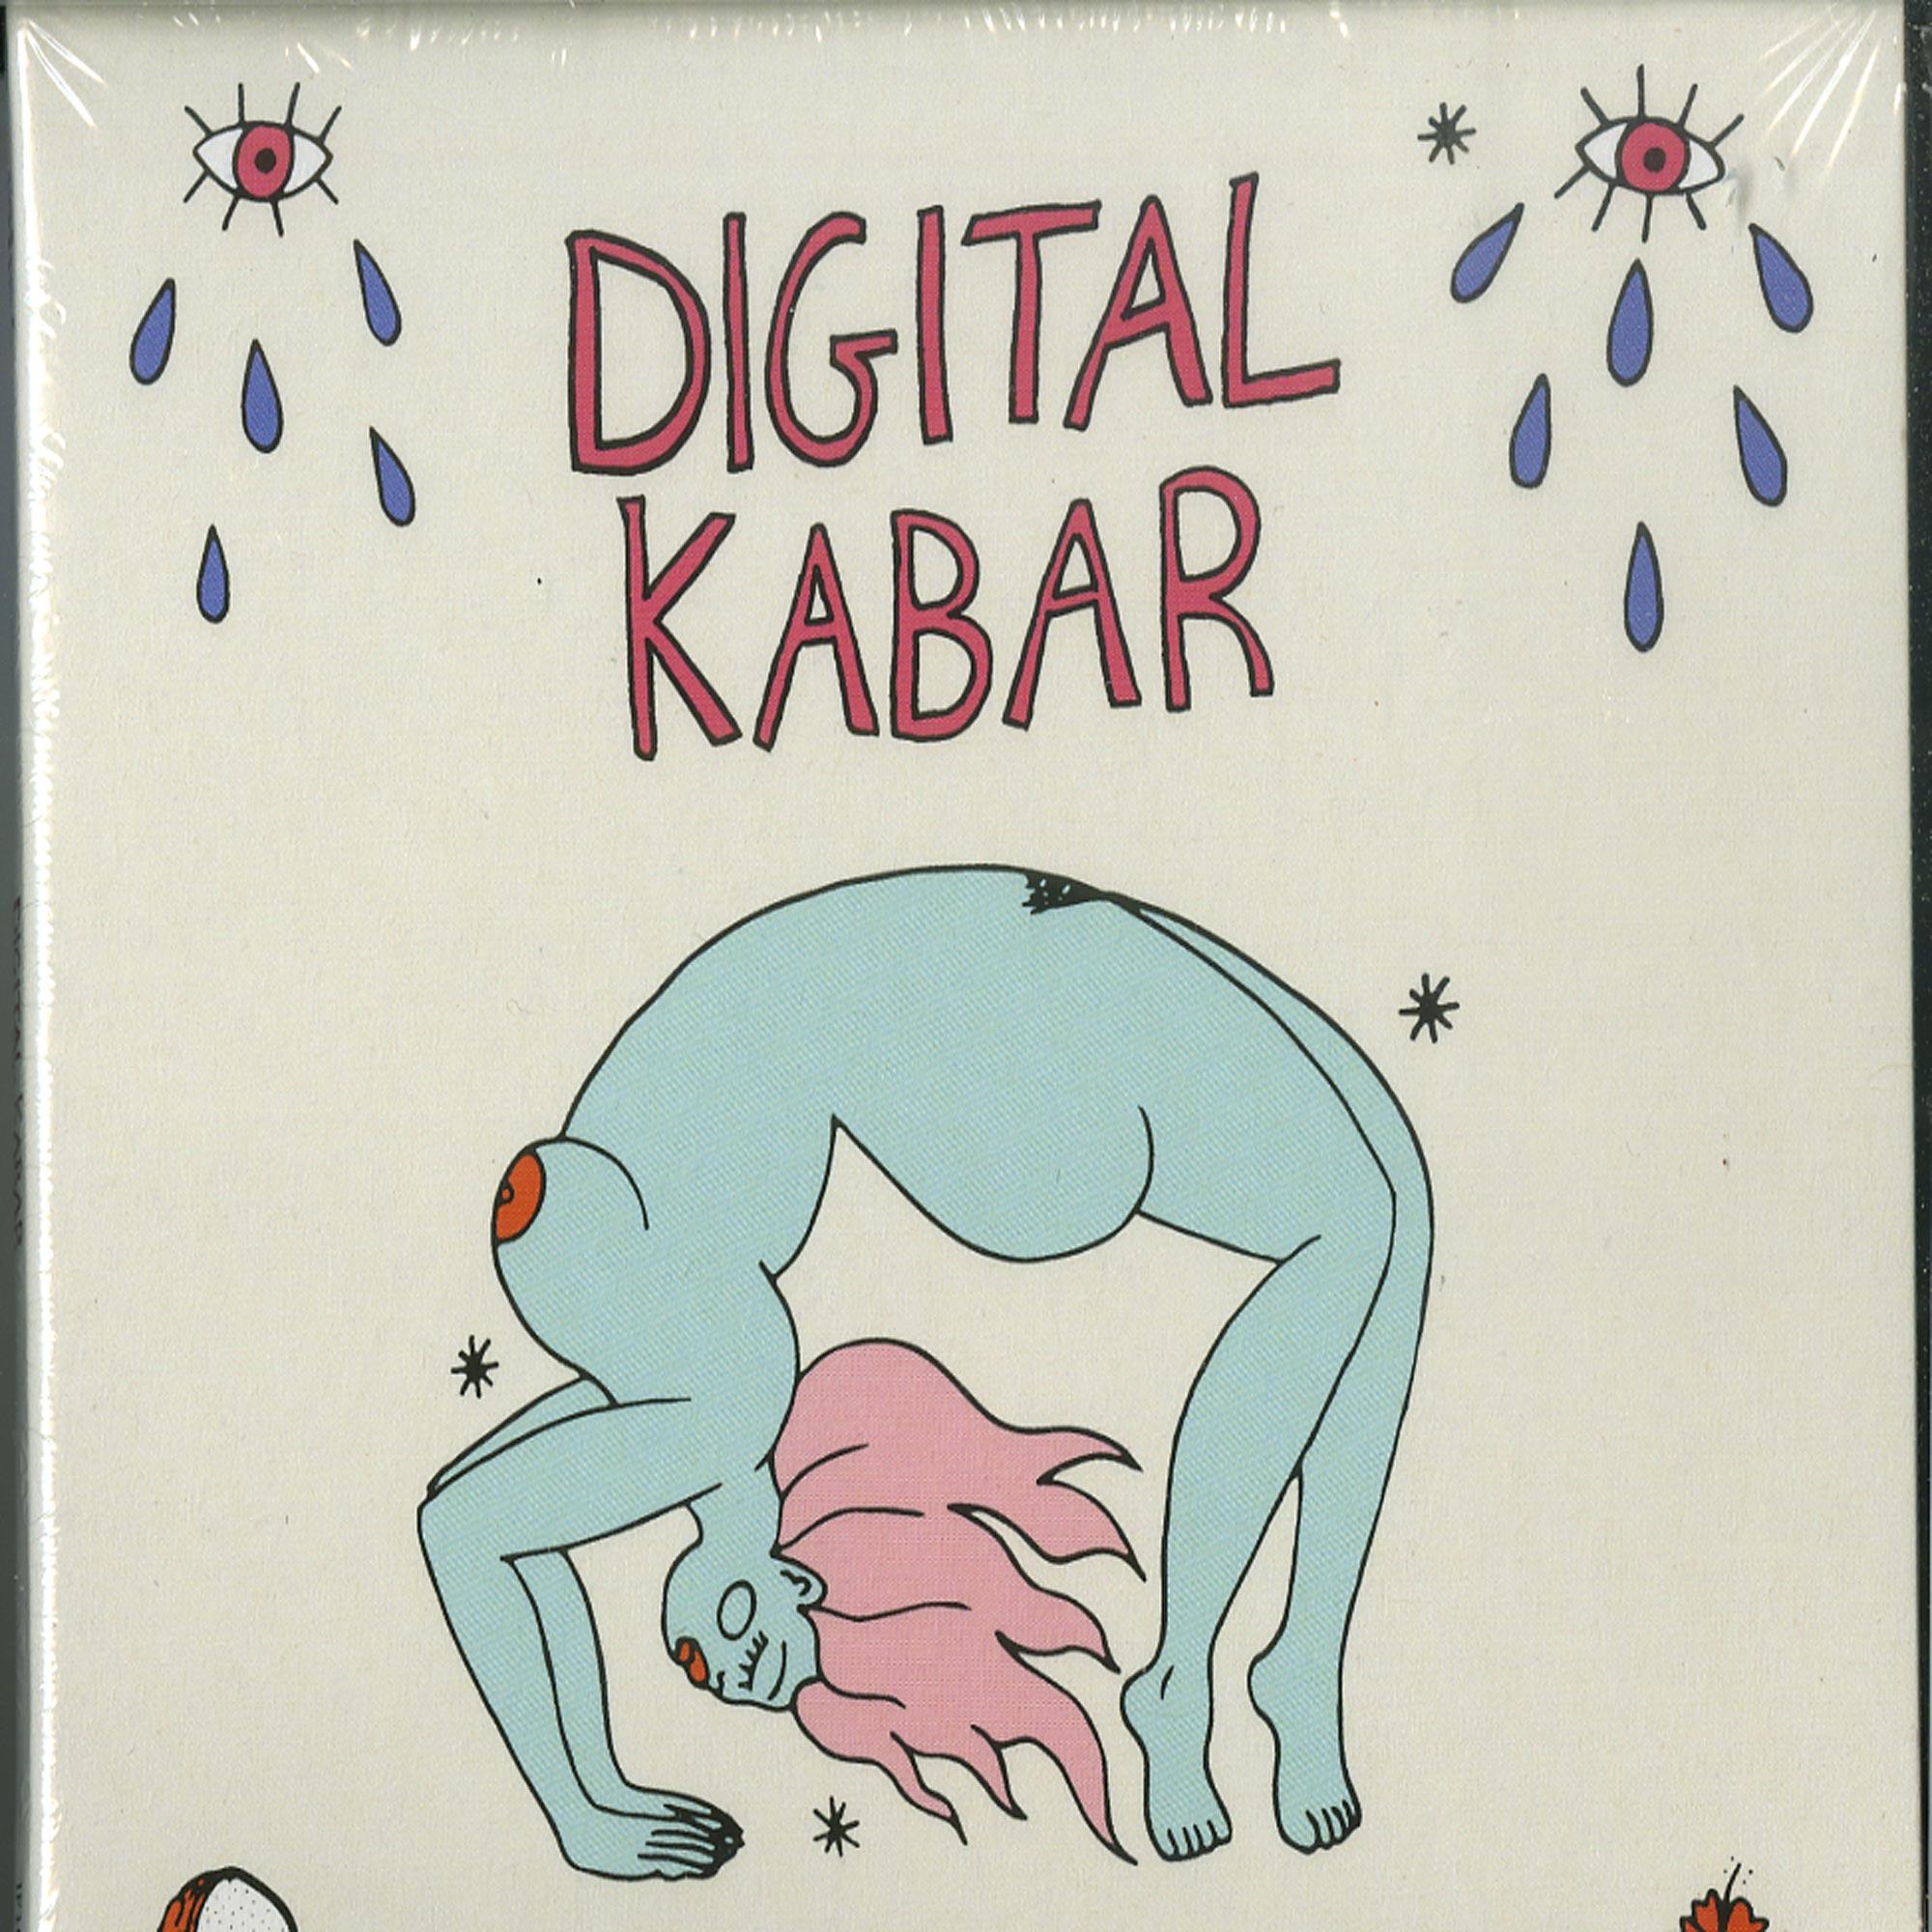 Various Artists - Digital Kabar - ELECTRONIC MALOYA FROM LA REUNION SINCE